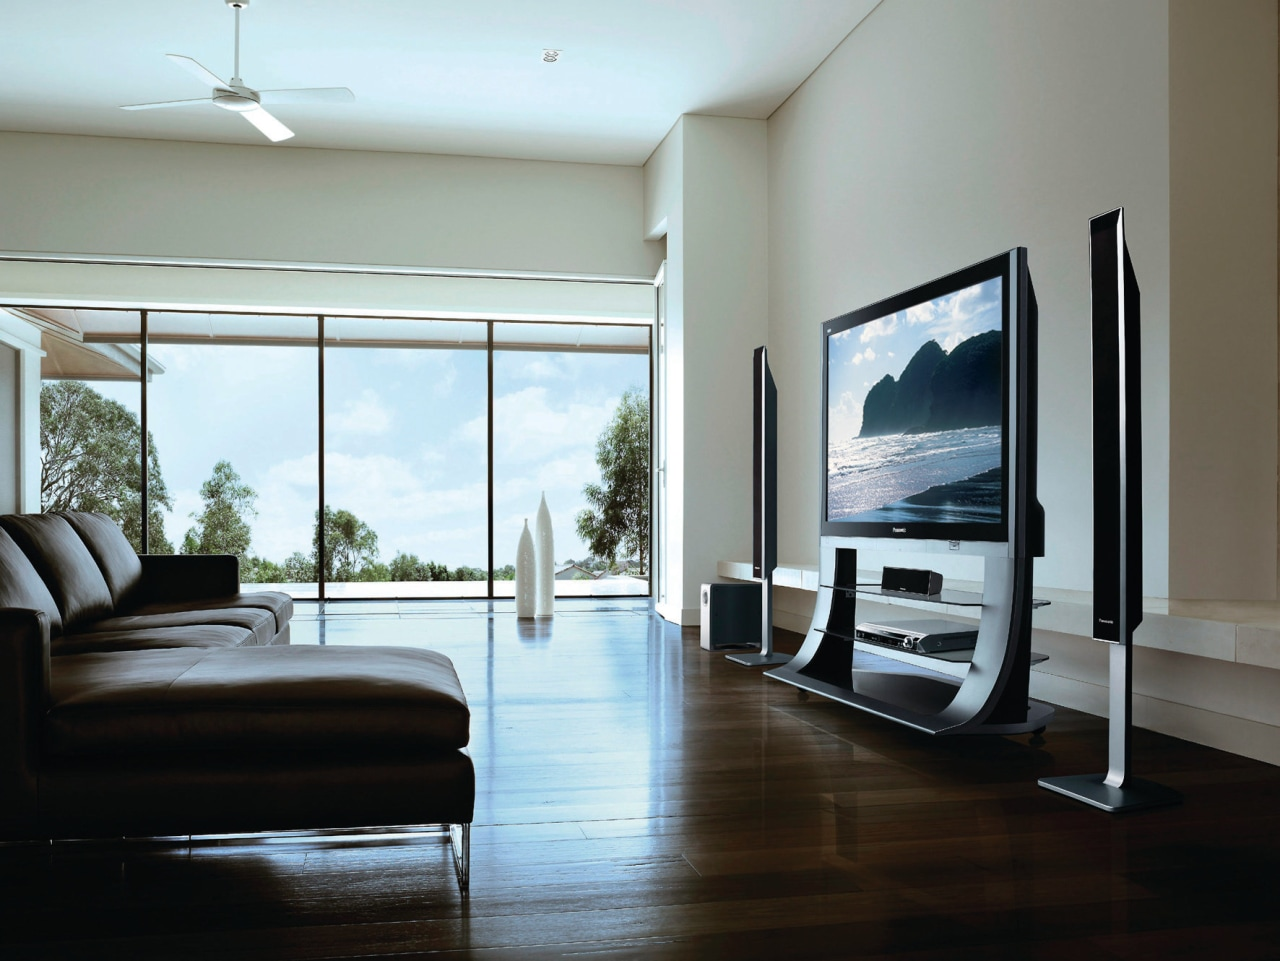 A view of this contemporary living area featuring door, floor, flooring, furniture, hardwood, interior design, living room, real estate, room, window, wood flooring, gray, black, white